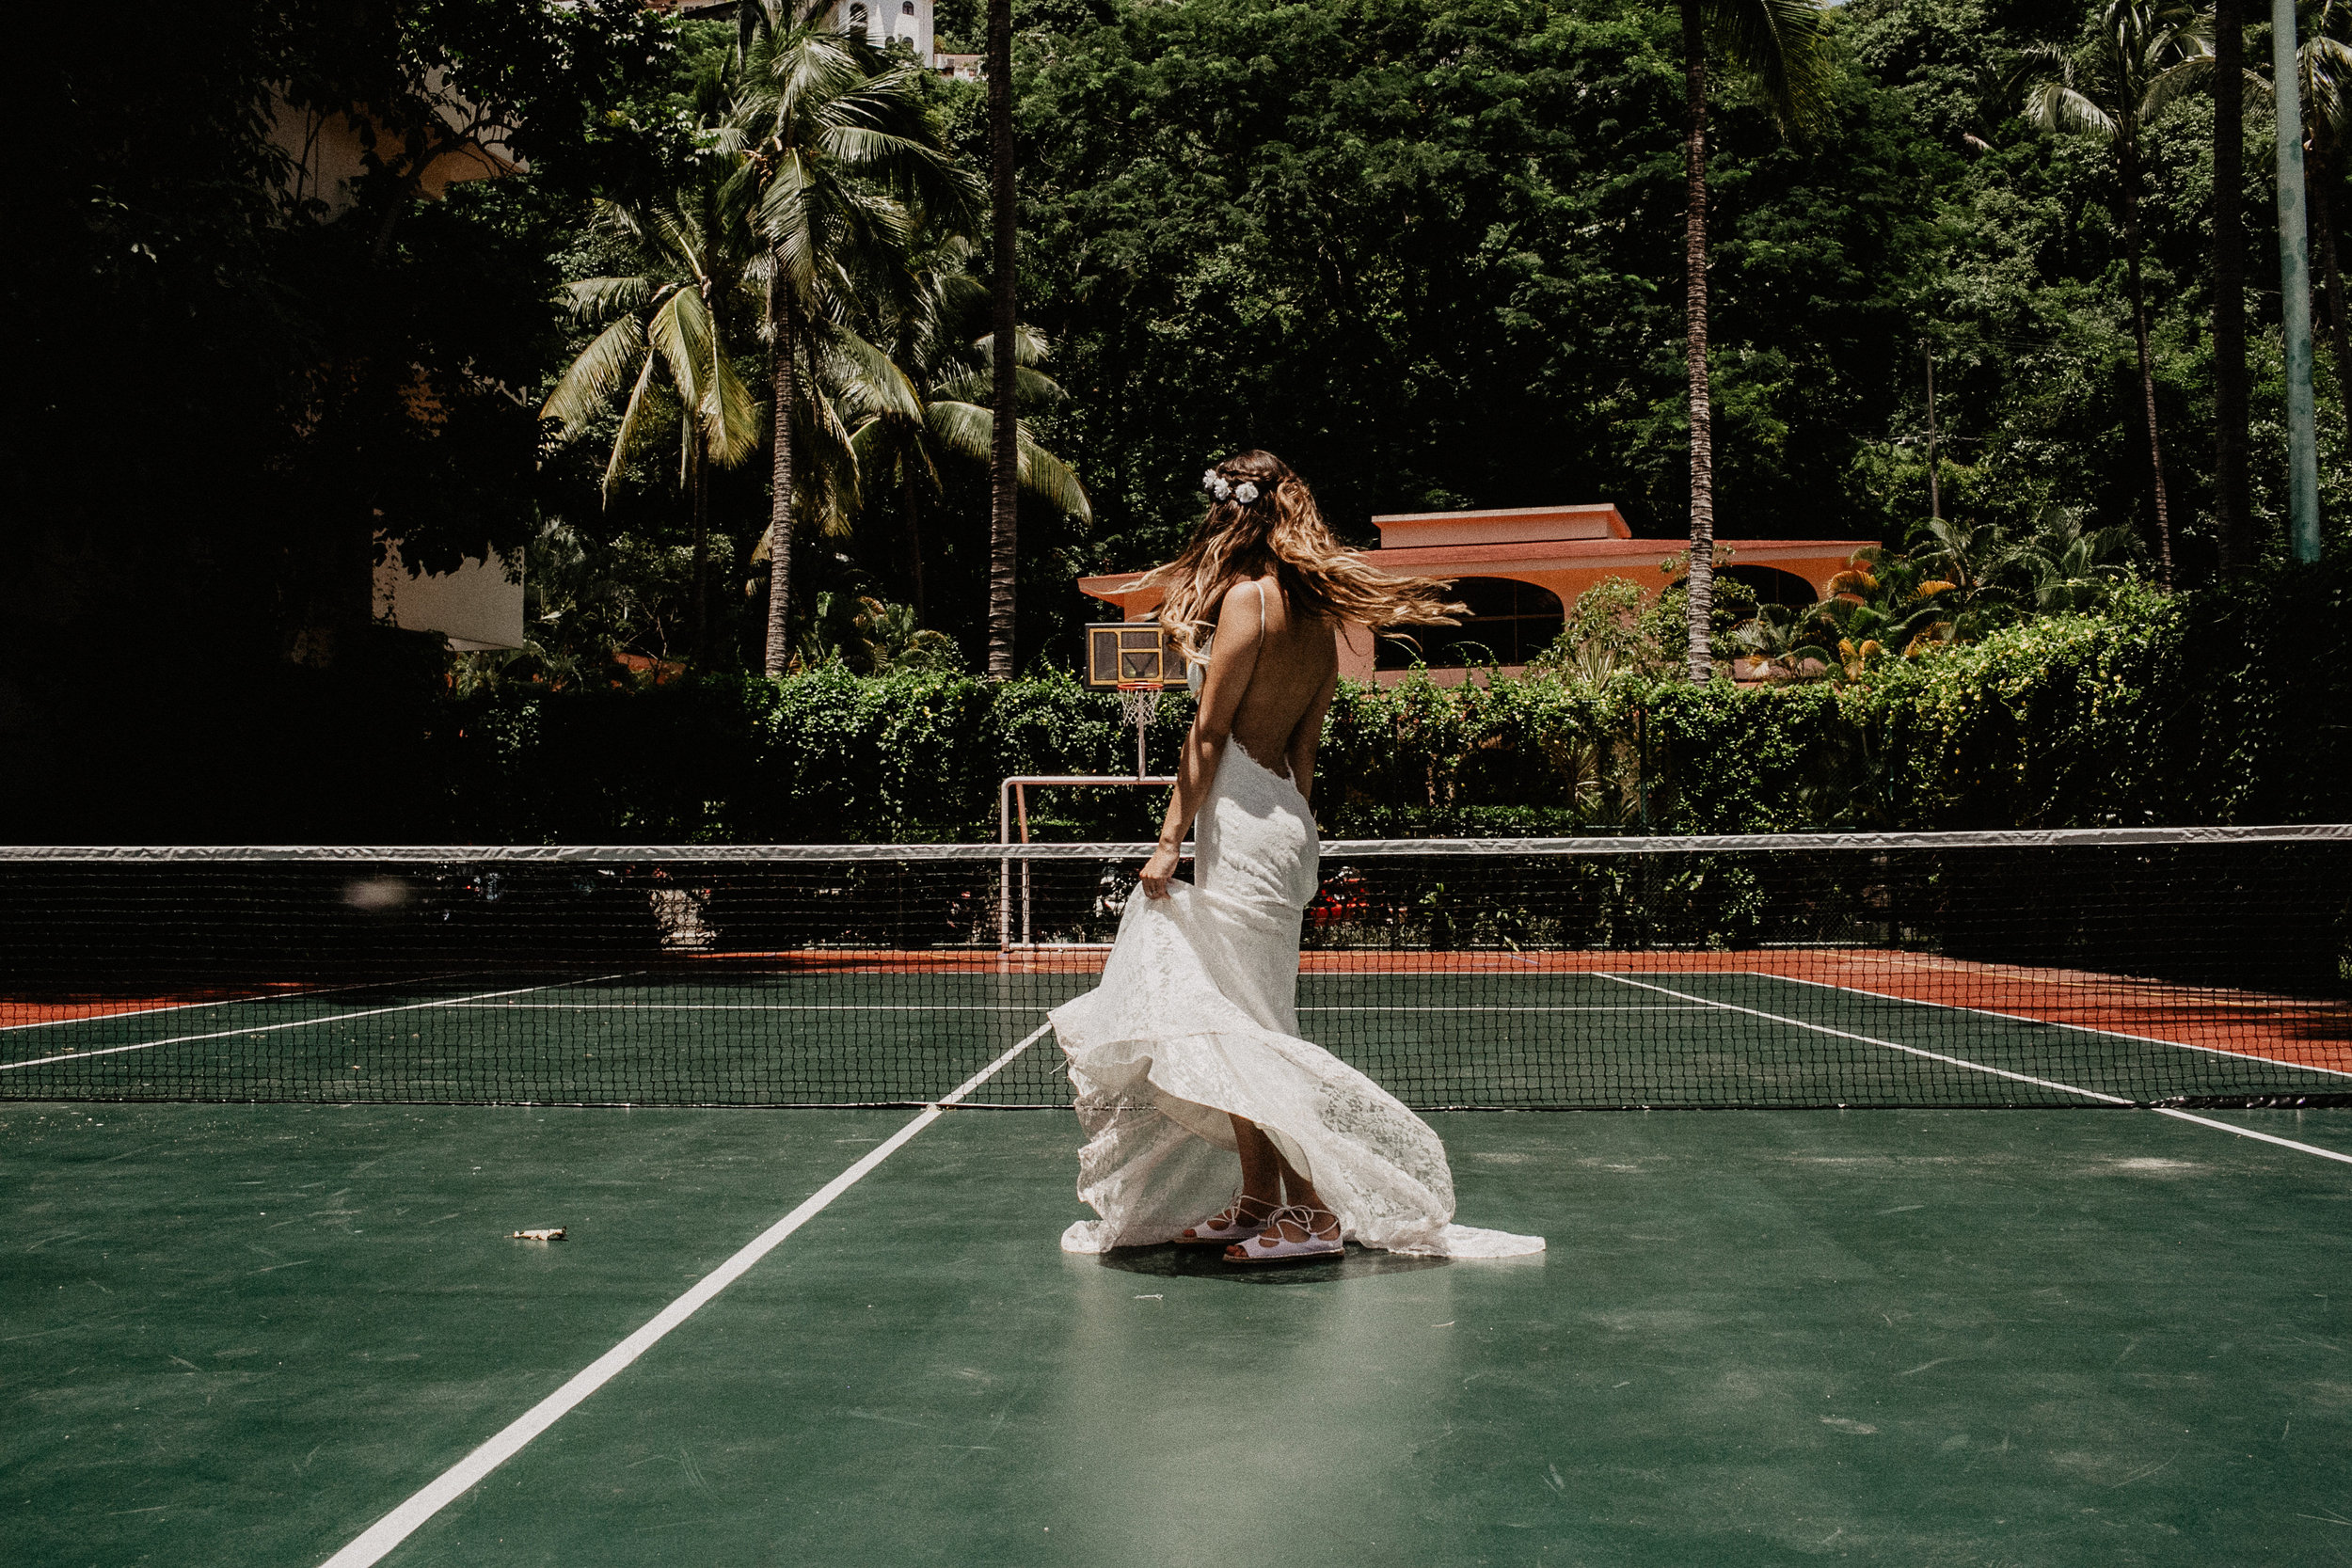 alfonso_flores_destination_wedding_photography_puerto_vallarta_hotel_barcelo_vallarta_cuttler_amela-314.JPG